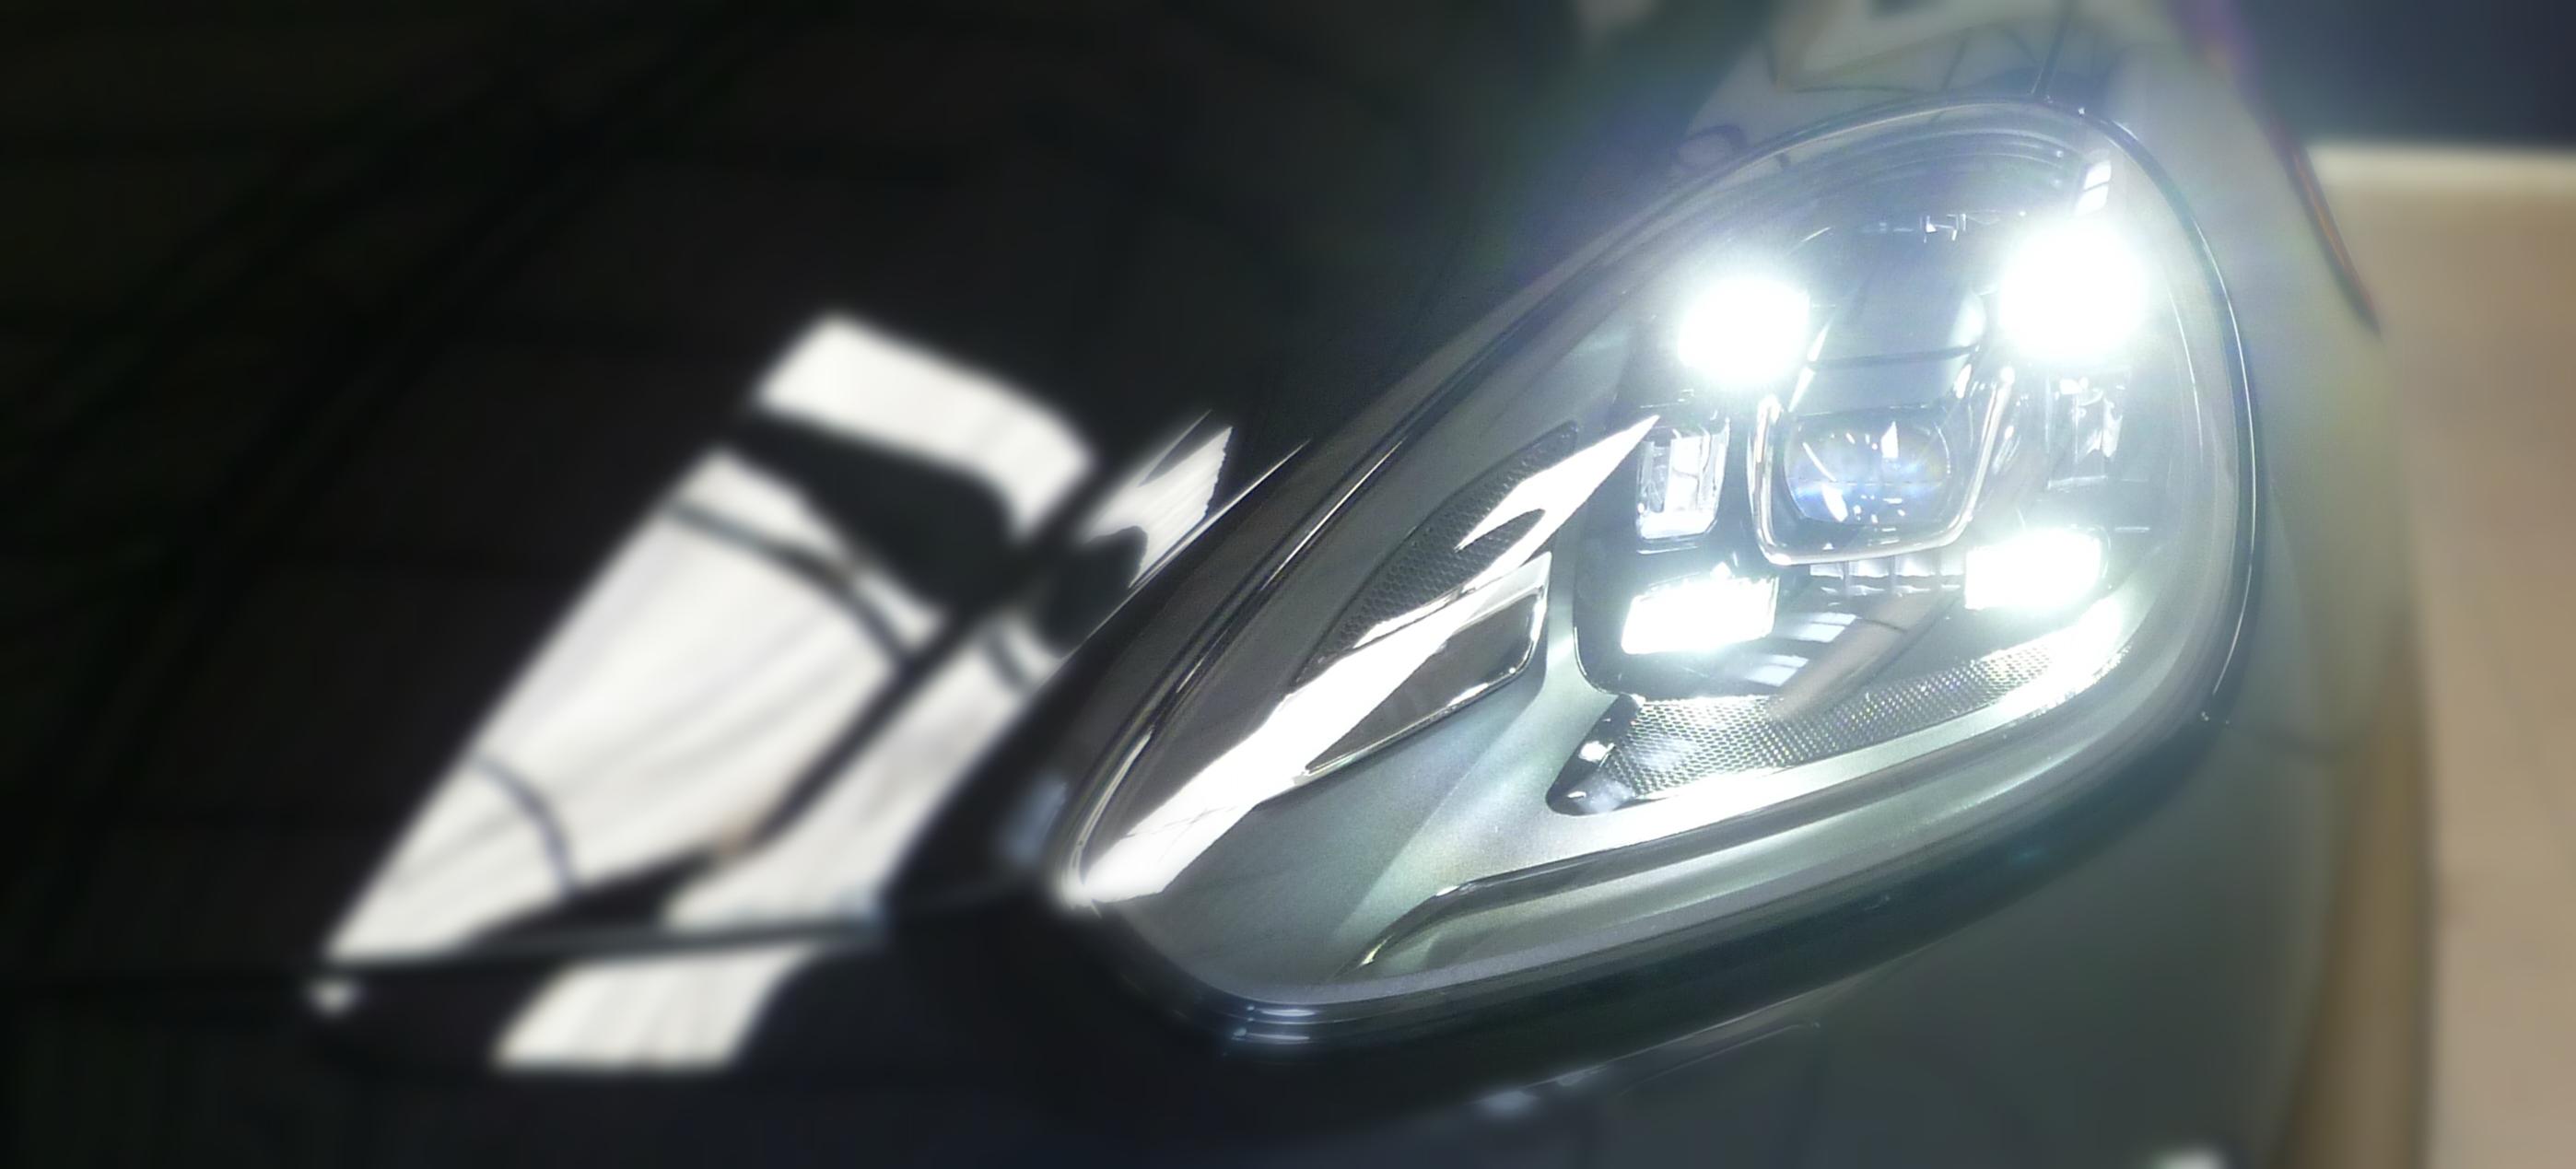 Porsche Cayenne, uno sguardo da vicino